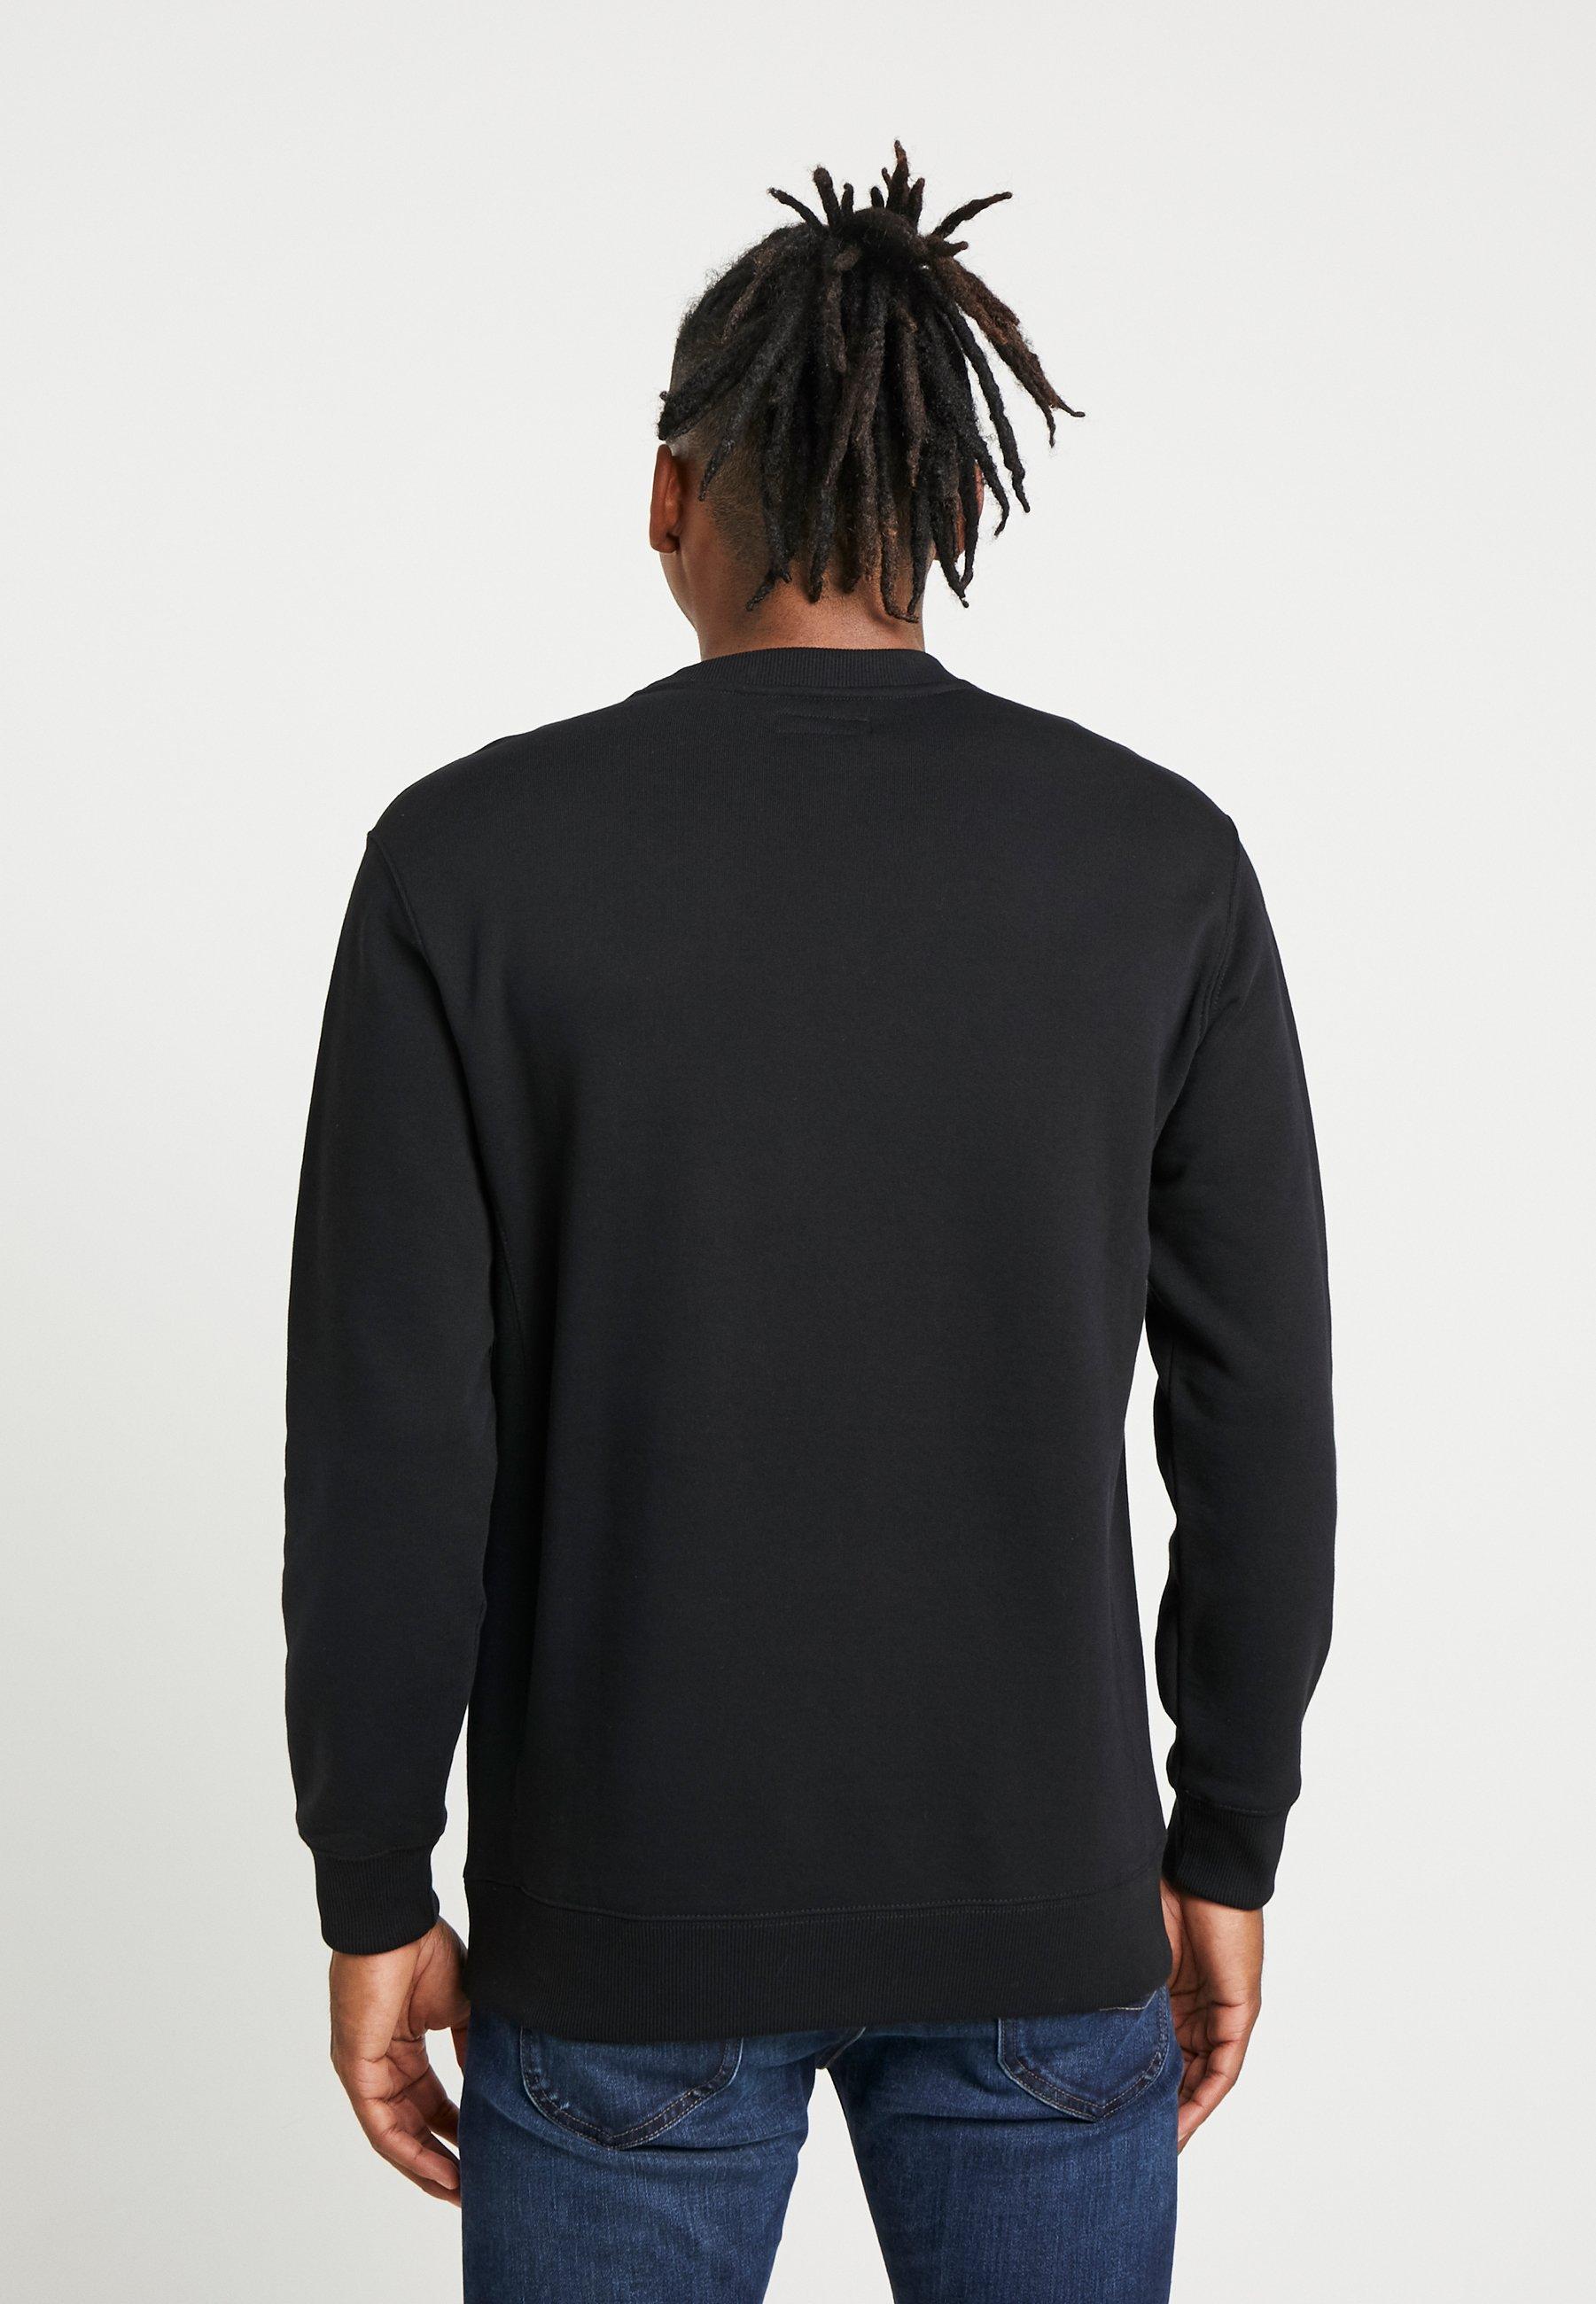 Lee Lee CrewSweatshirt Black Lee CrewSweatshirt CrewSweatshirt Lee Black Black CrewSweatshirt Lee Black qUGMLpSzV